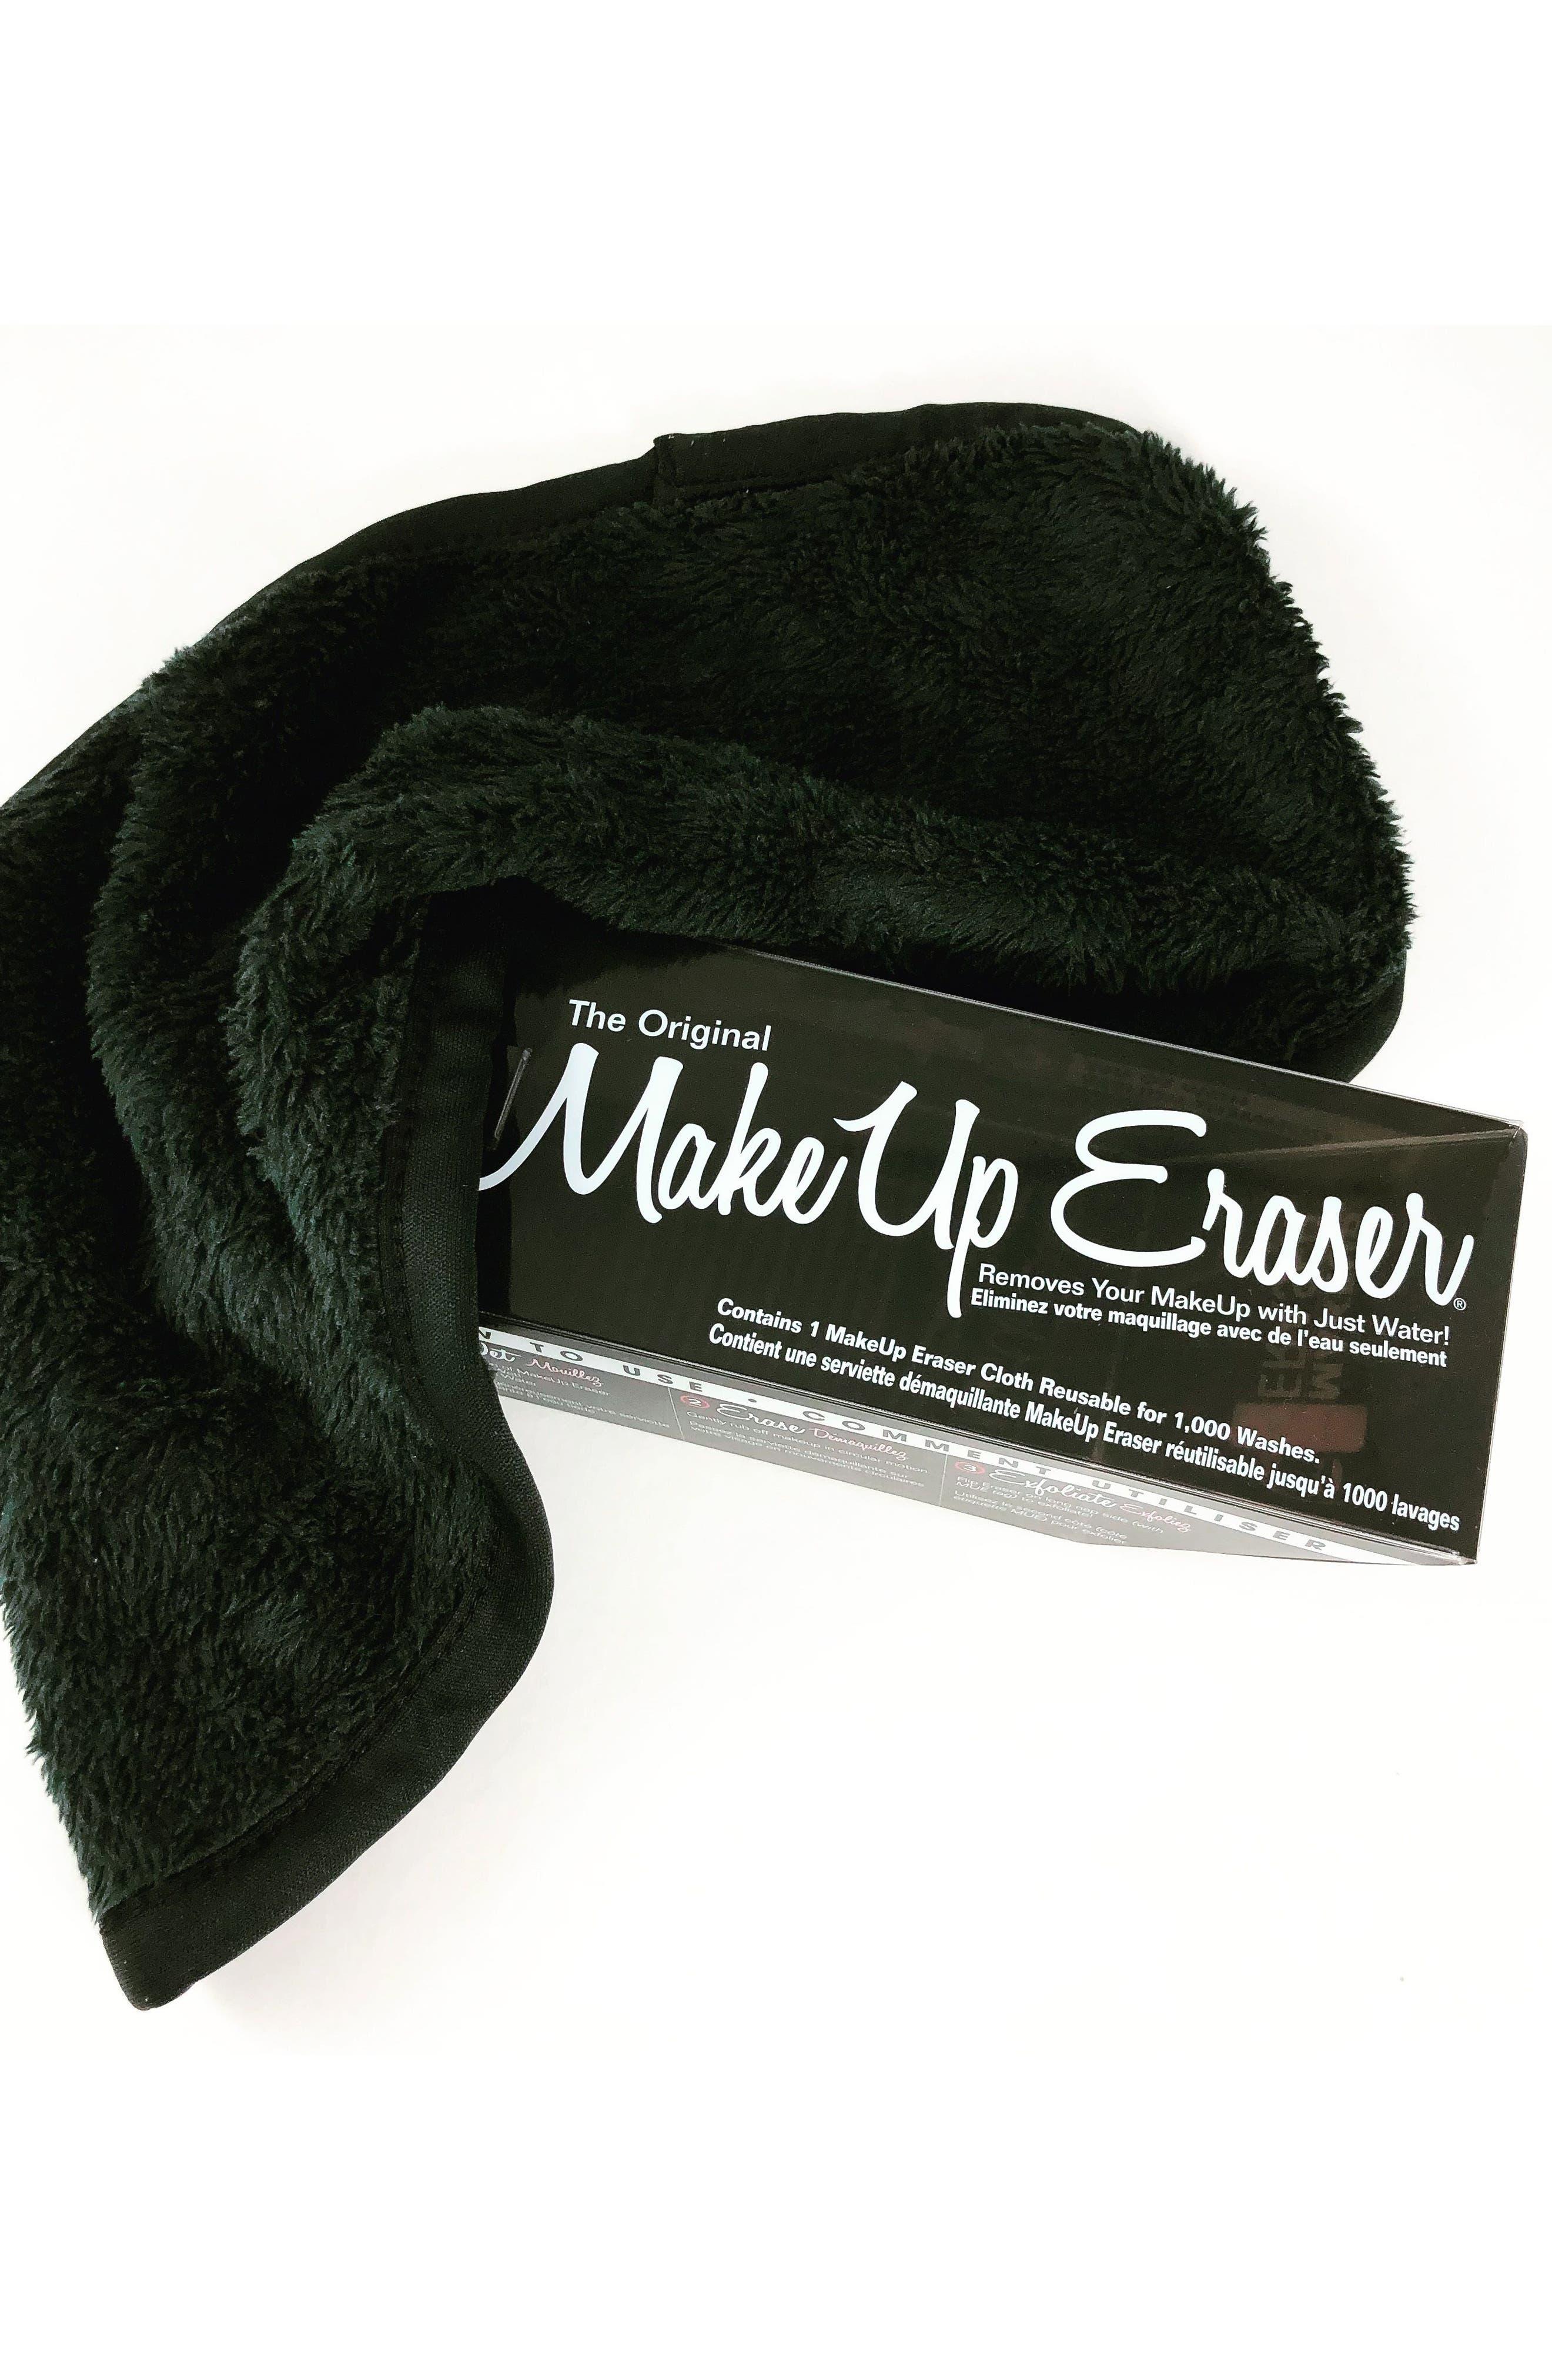 'The Original' Makeup Eraser,                             Alternate thumbnail 4, color,                             001